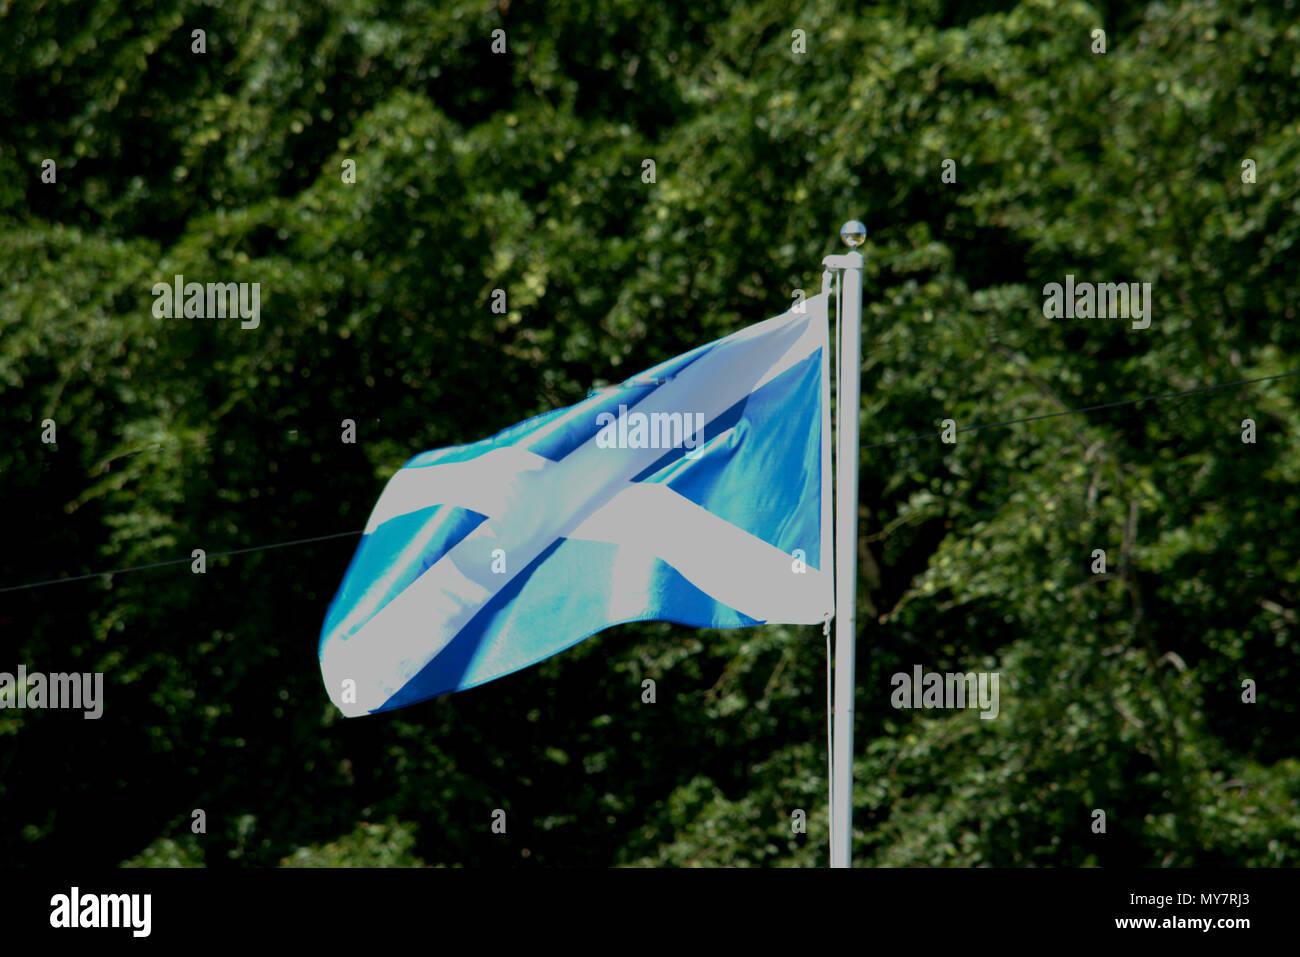 Scottish flag, St. Andrew's cross, the saltire - Stock Image